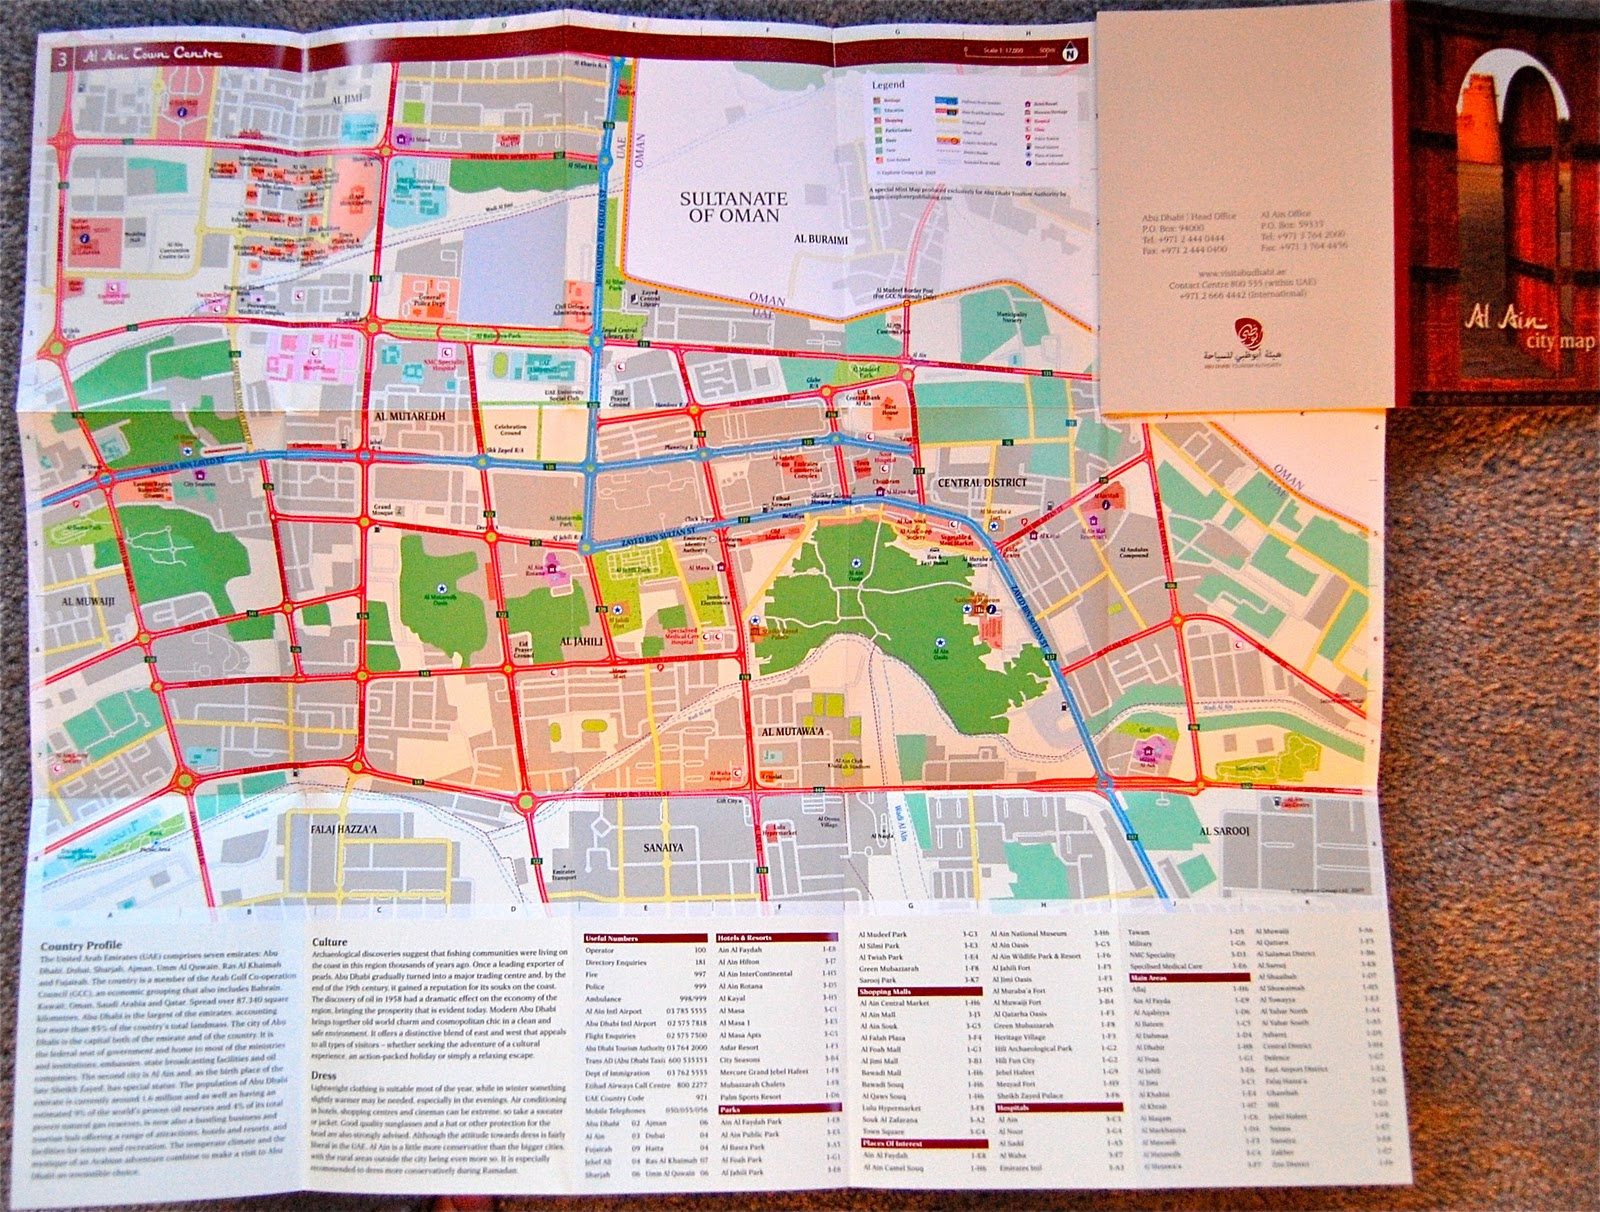 Dubai Its Me In The UAE Maps - Al ain map